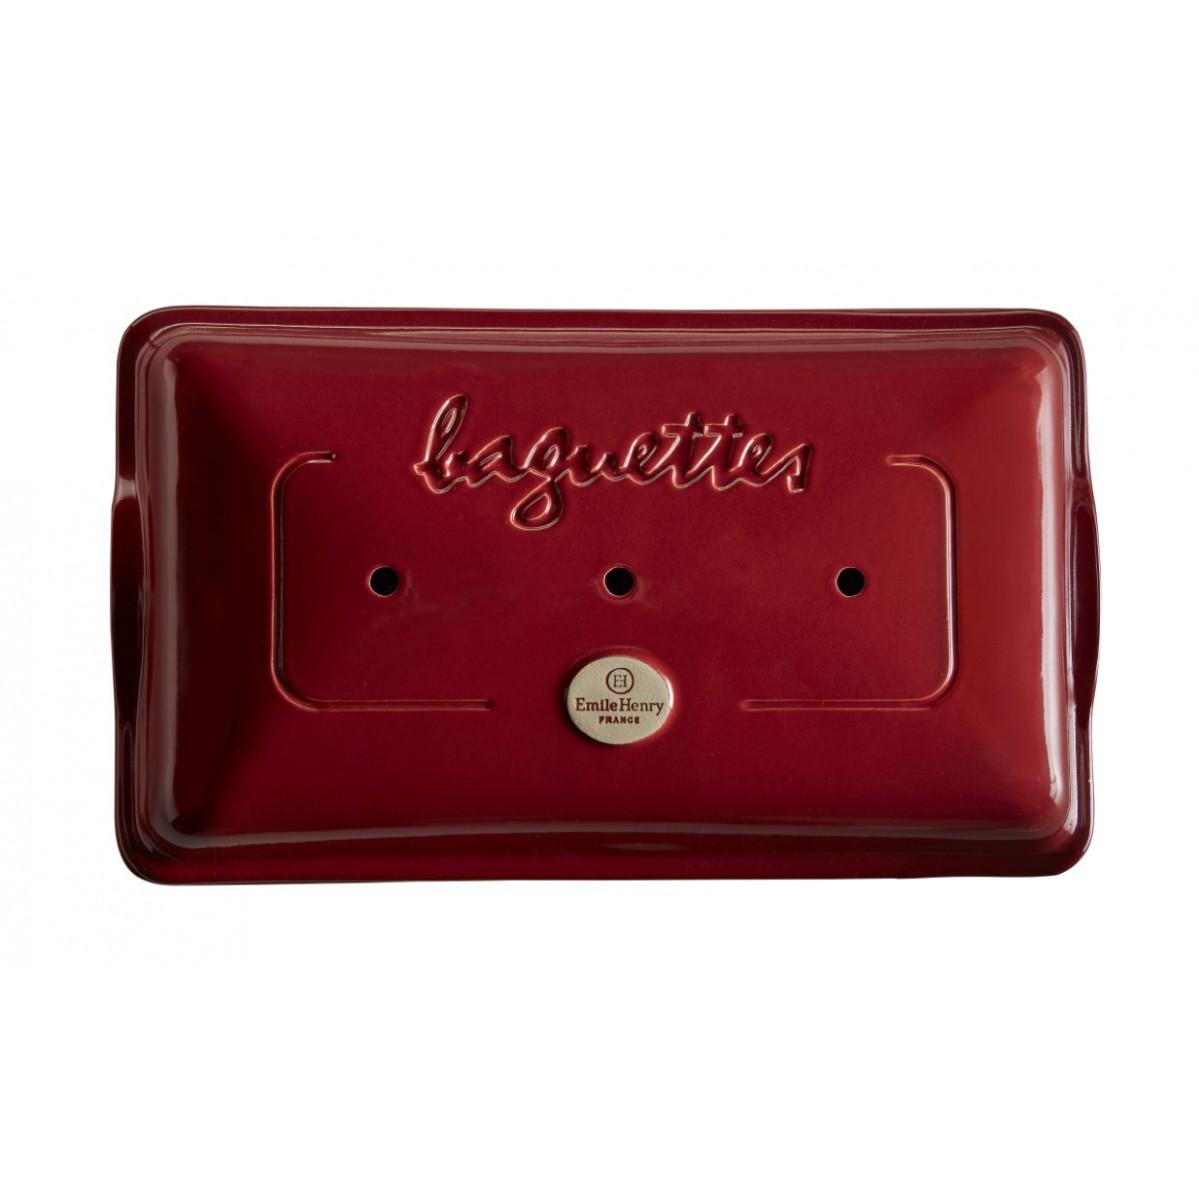 Brotbackform Baguette | Burgundy Rot